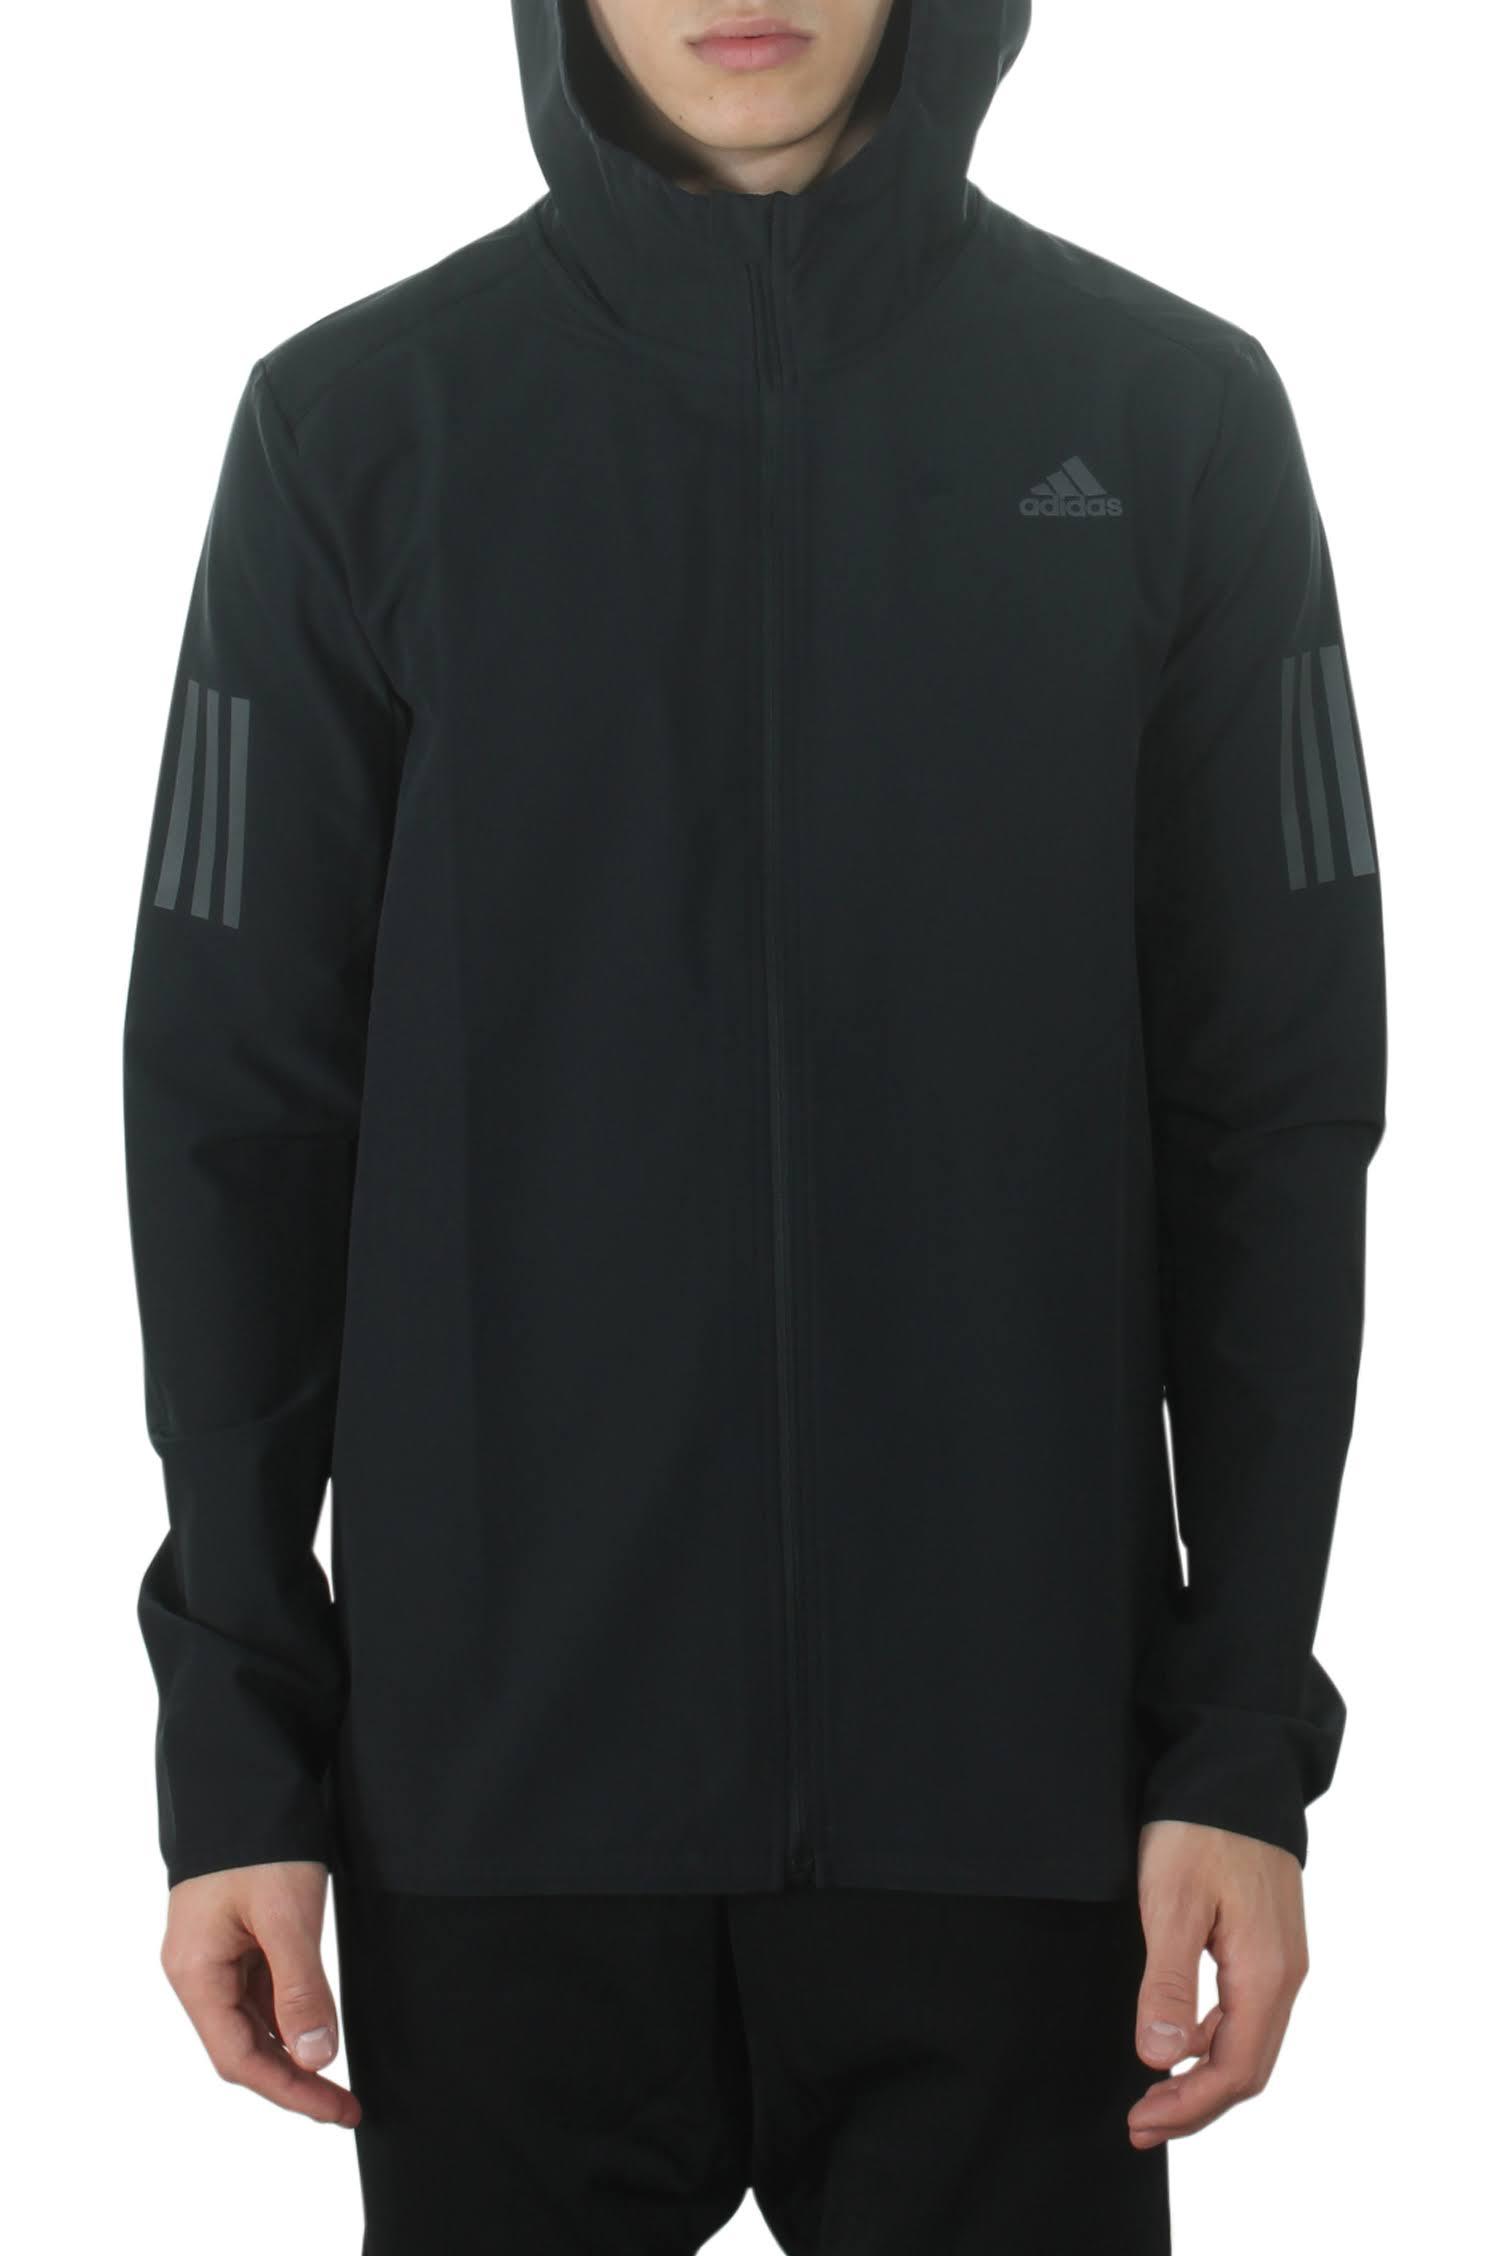 Pequeño Running Negro Shell Para Response Adidas Hombre Xw8qvn